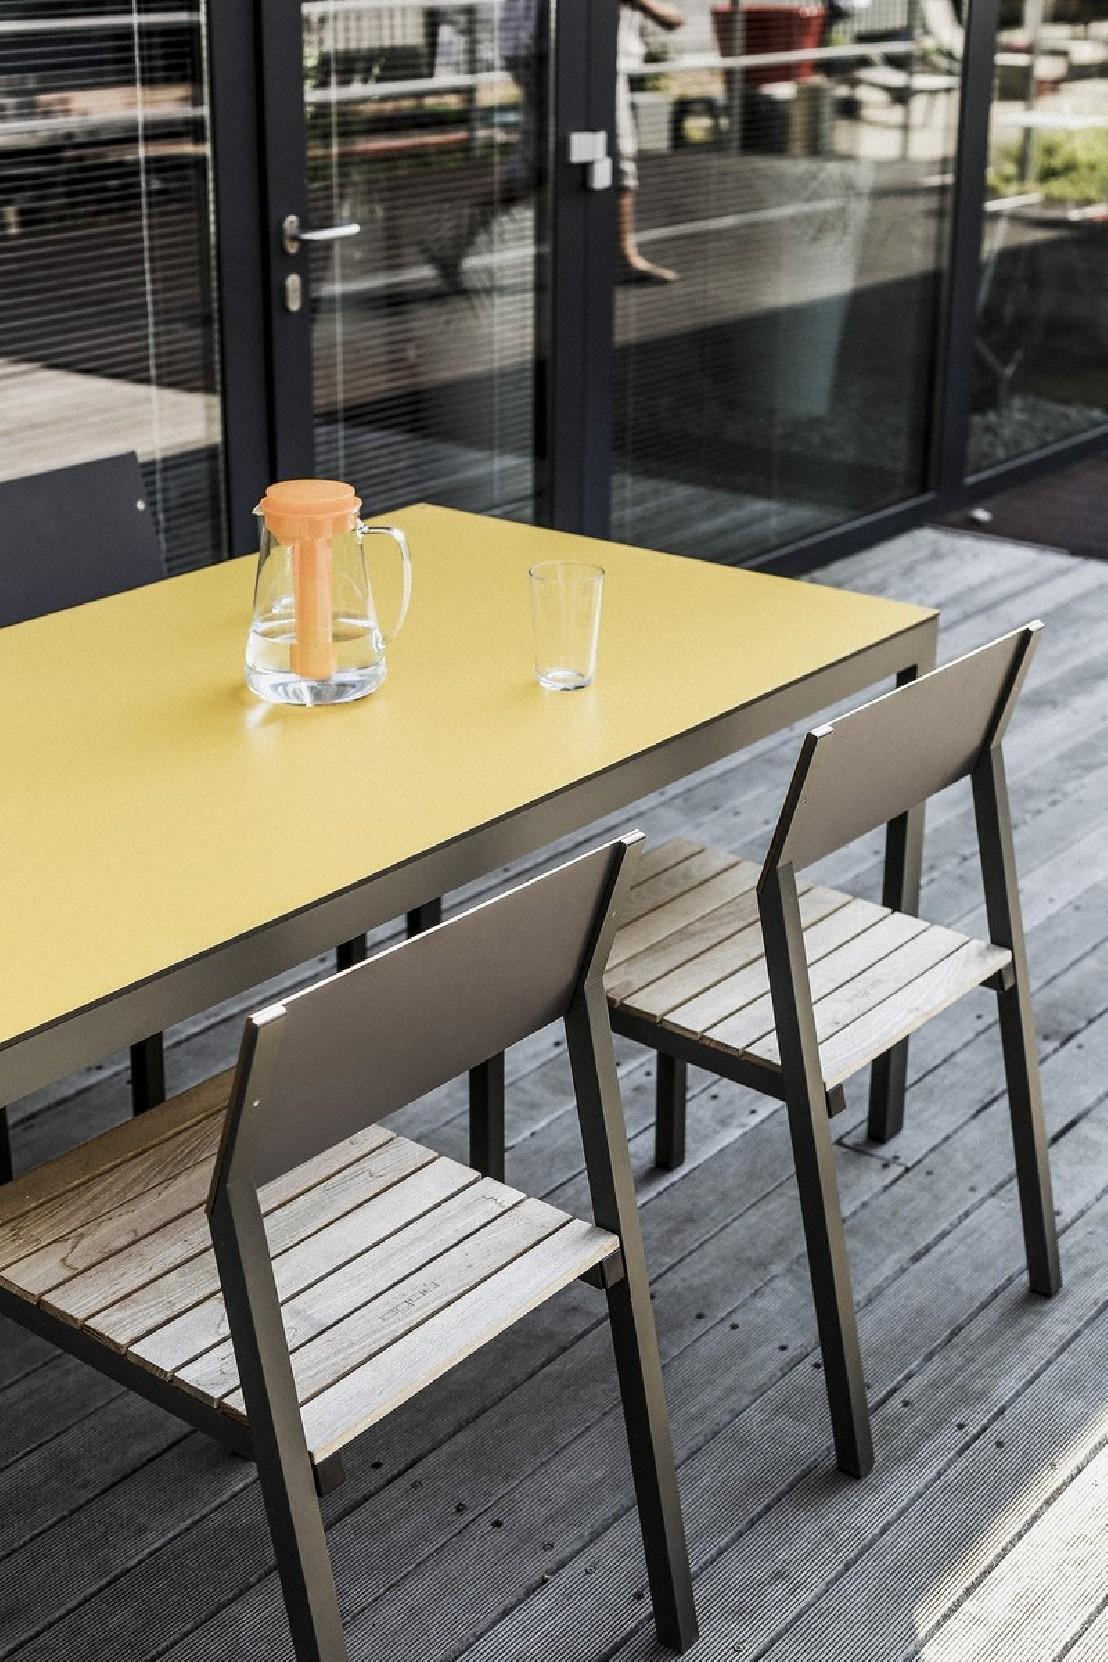 Salon De Jardin Cora, Table Rectangle 175 Cm Et 4 Chaises ... concernant Salon De Jardin Cora